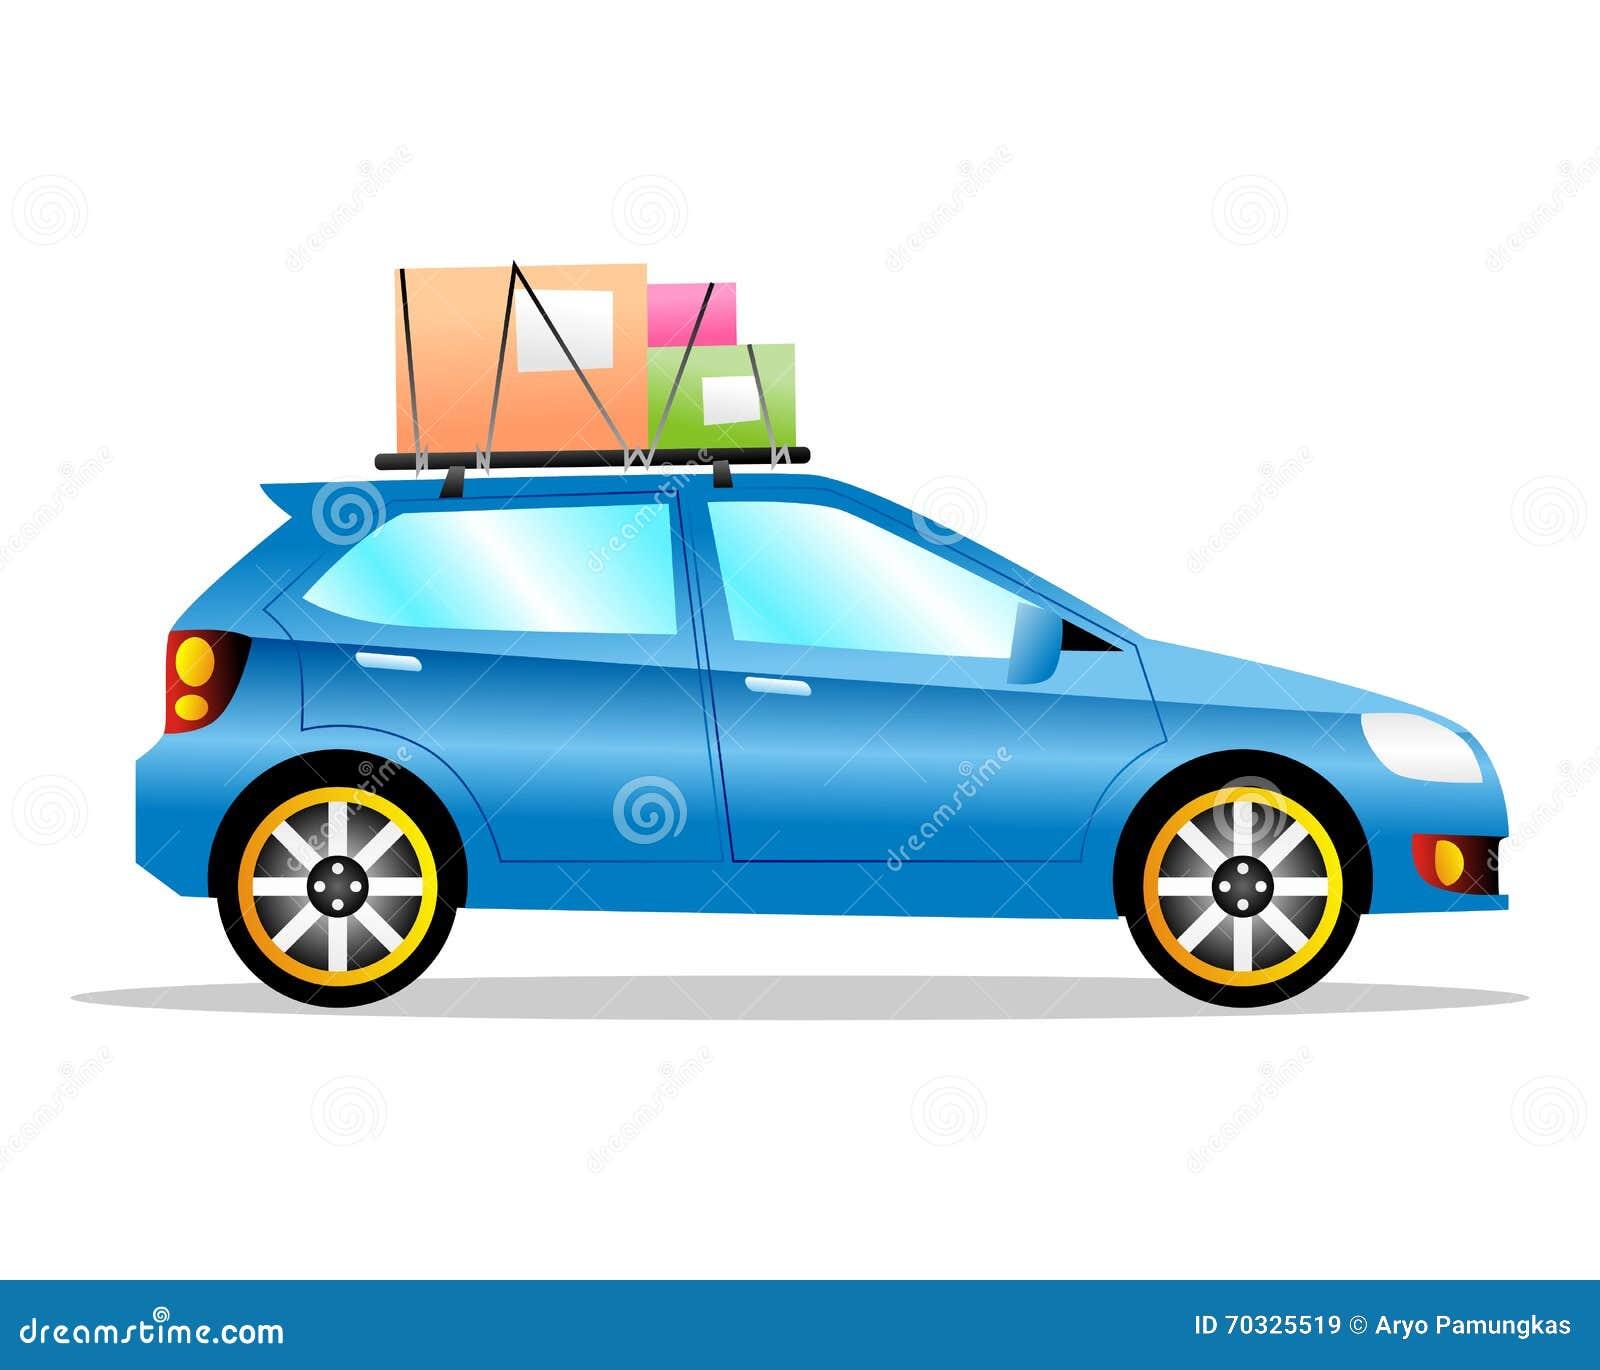 Auto Good Image: Travel Car Stock Photo